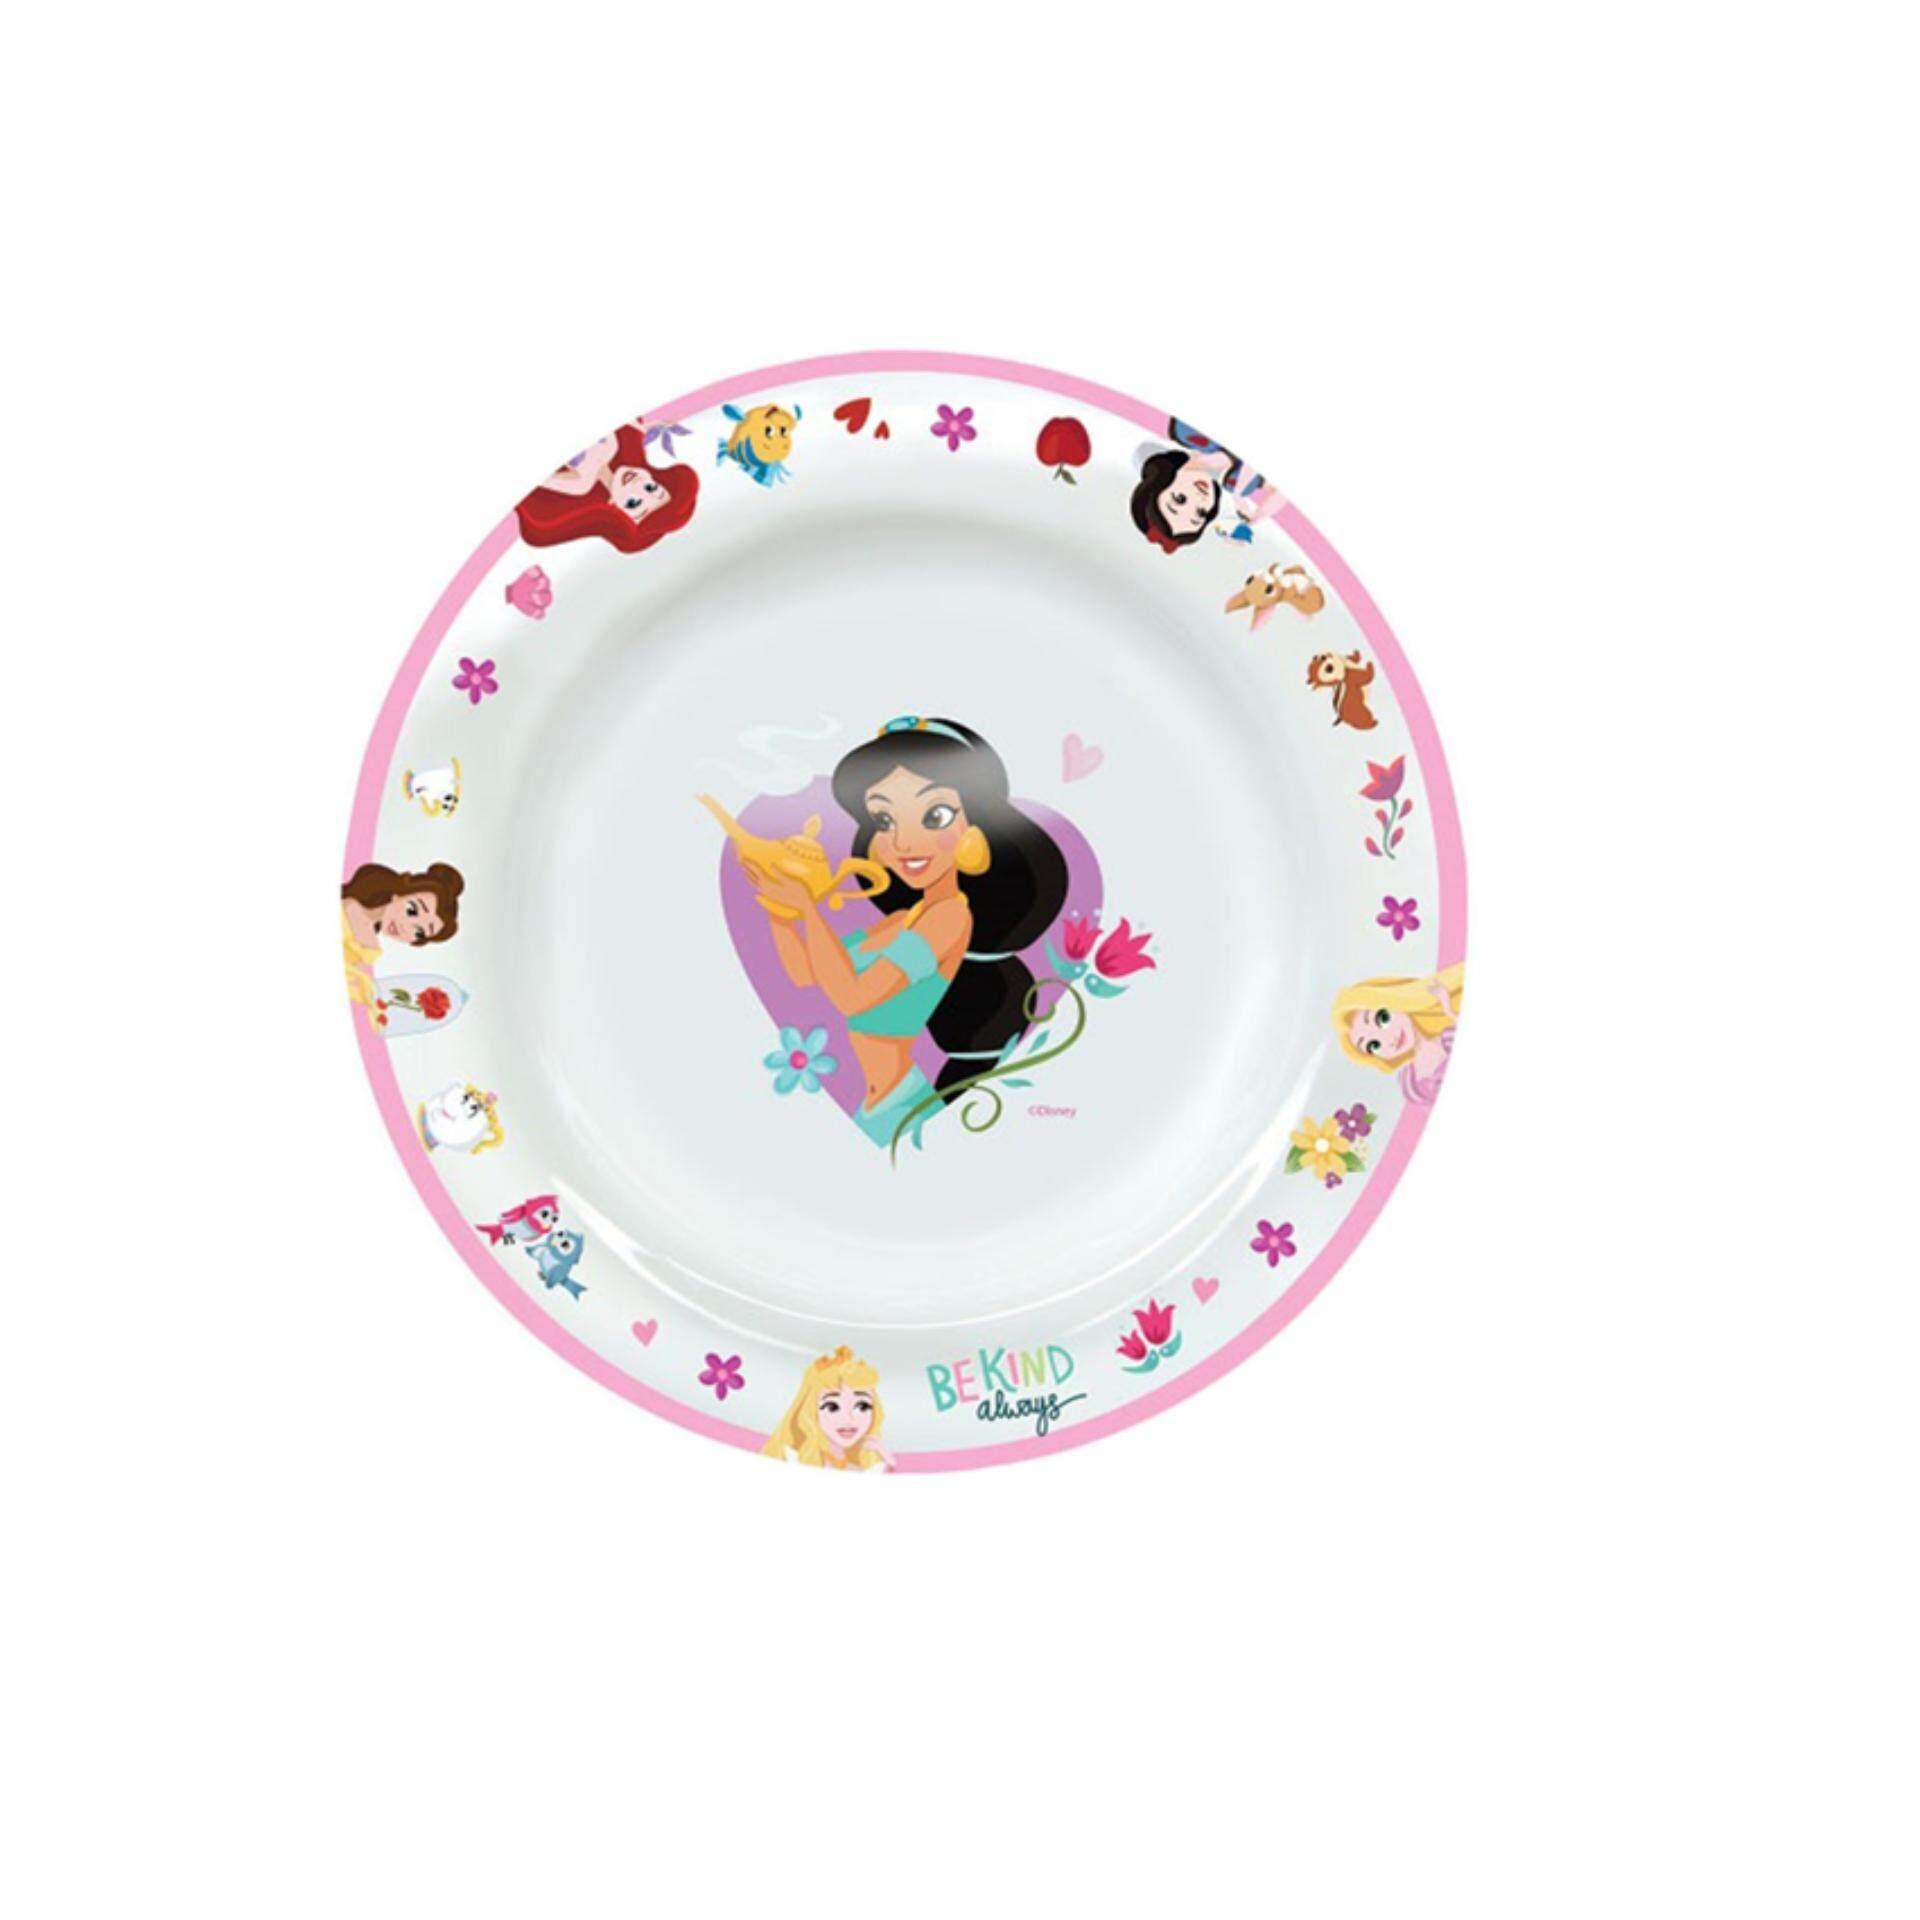 Disney Princess 8 Inches Deep Plate - Multiolour